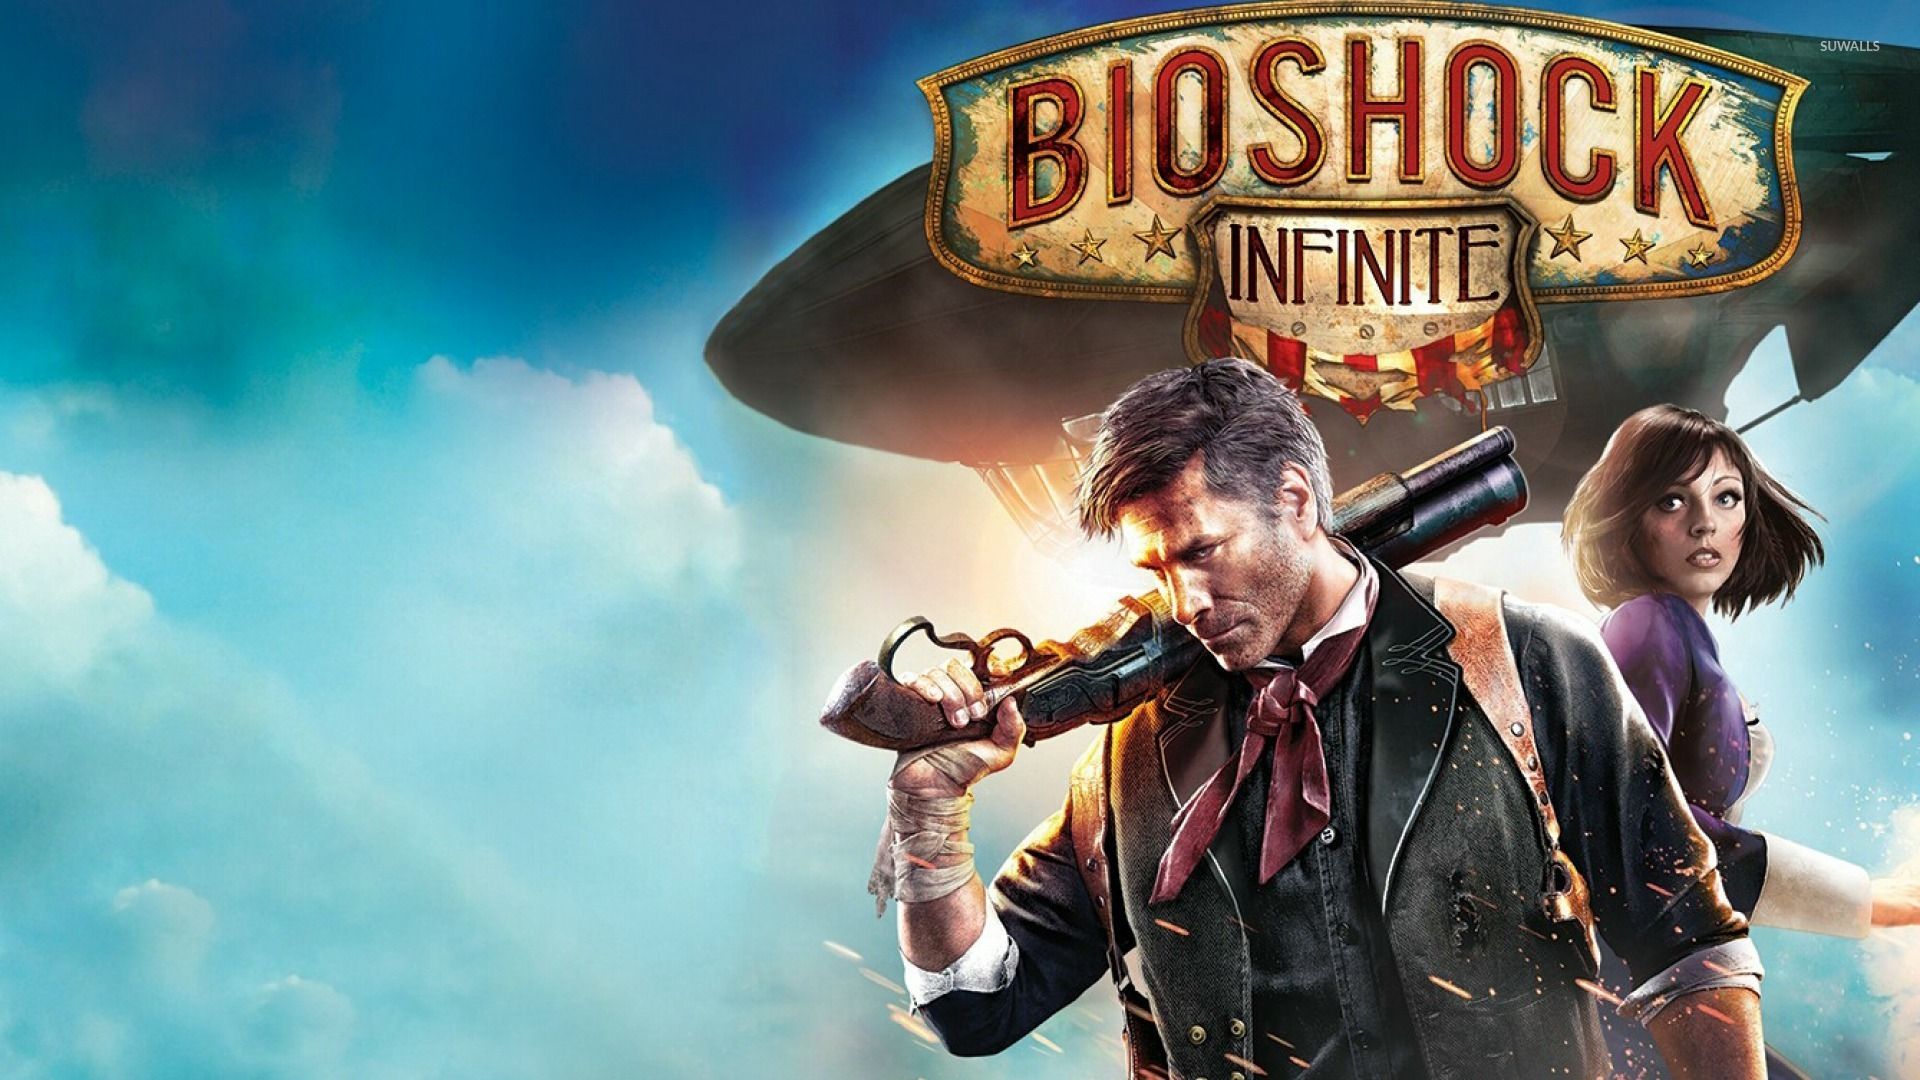 BioShock Infinite wallpaper - 1095990